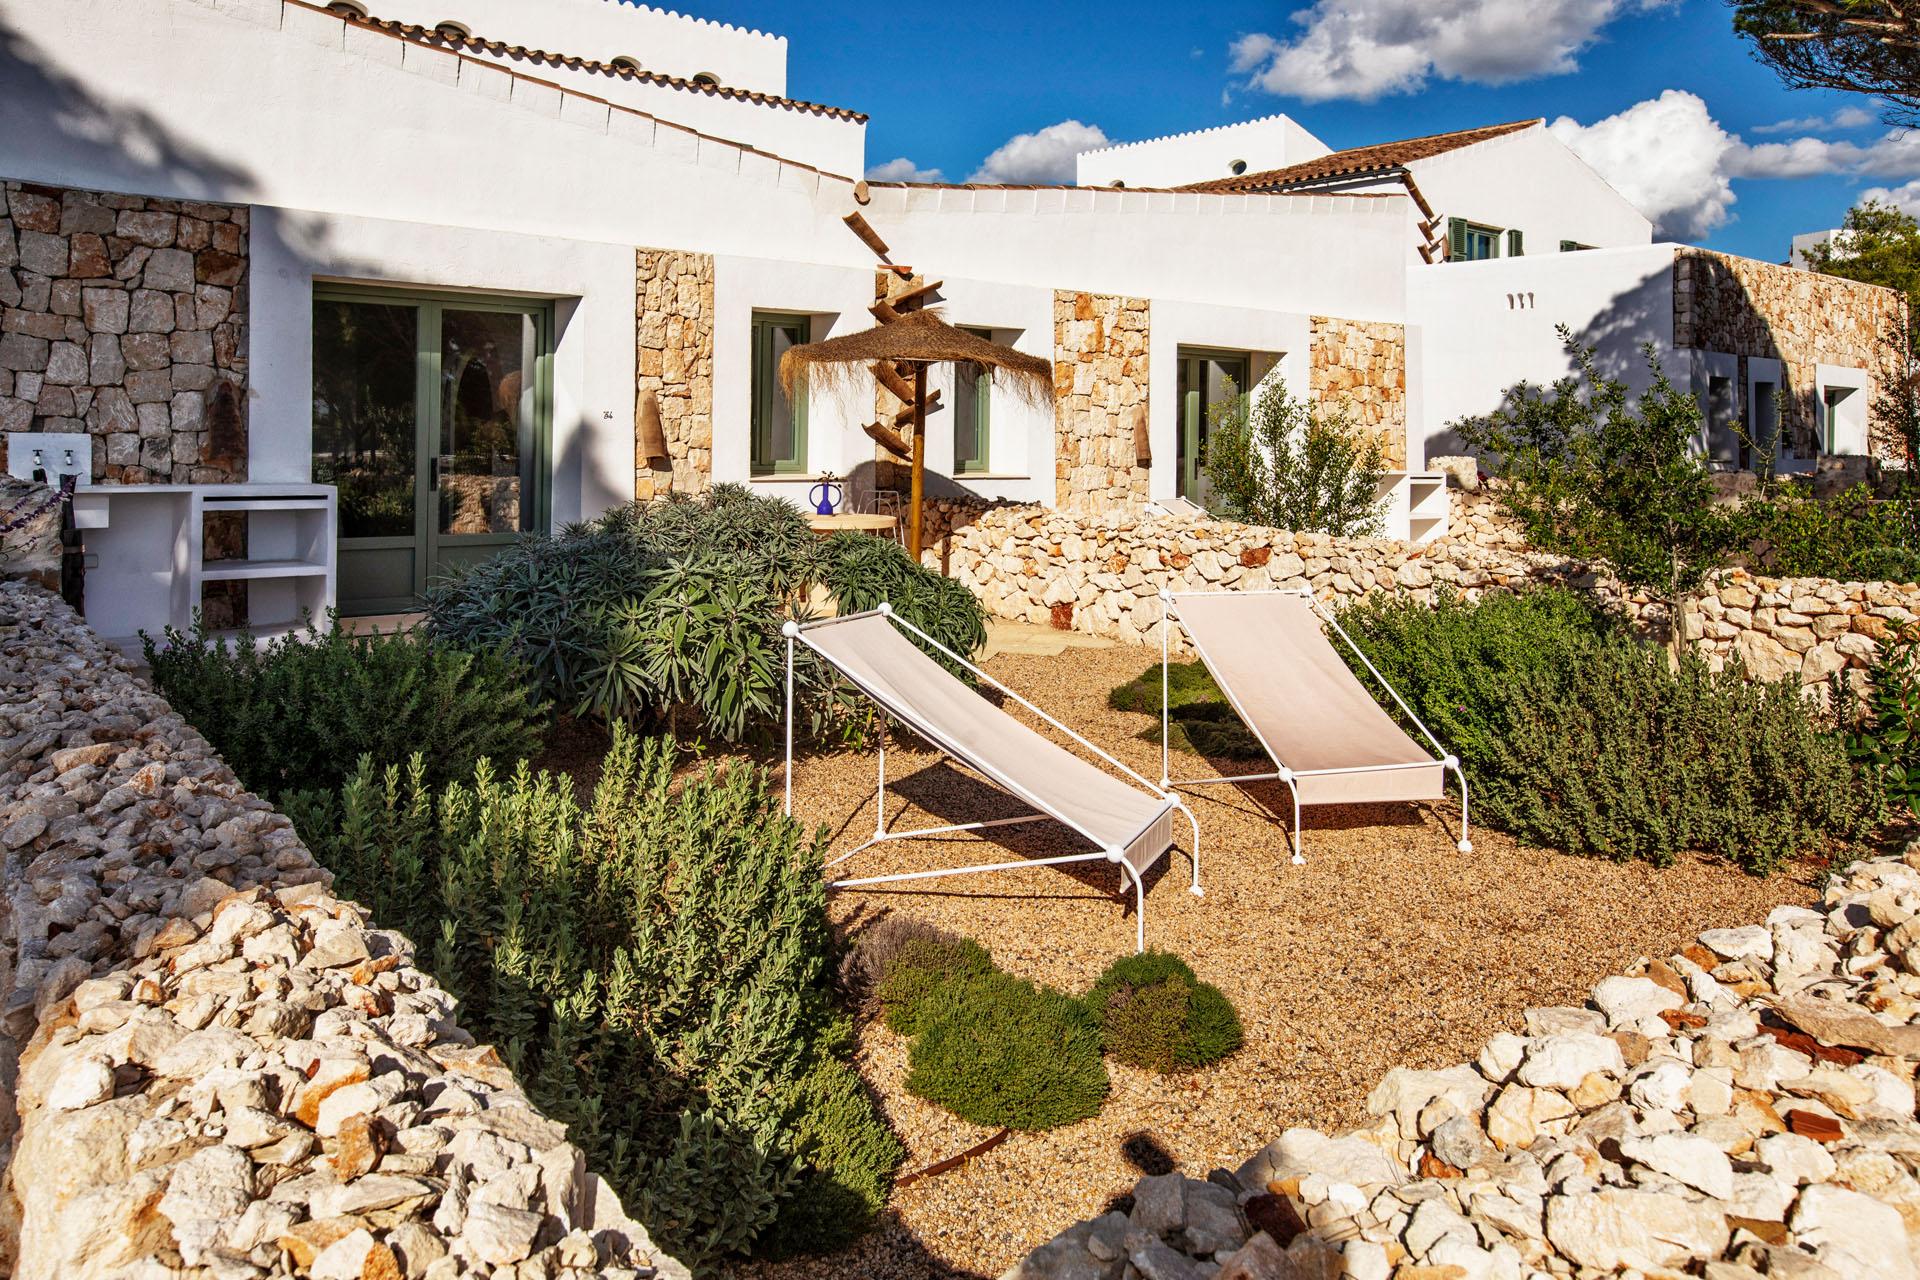 Habitación Mahon Garden 4 hotel experimental de Menorca